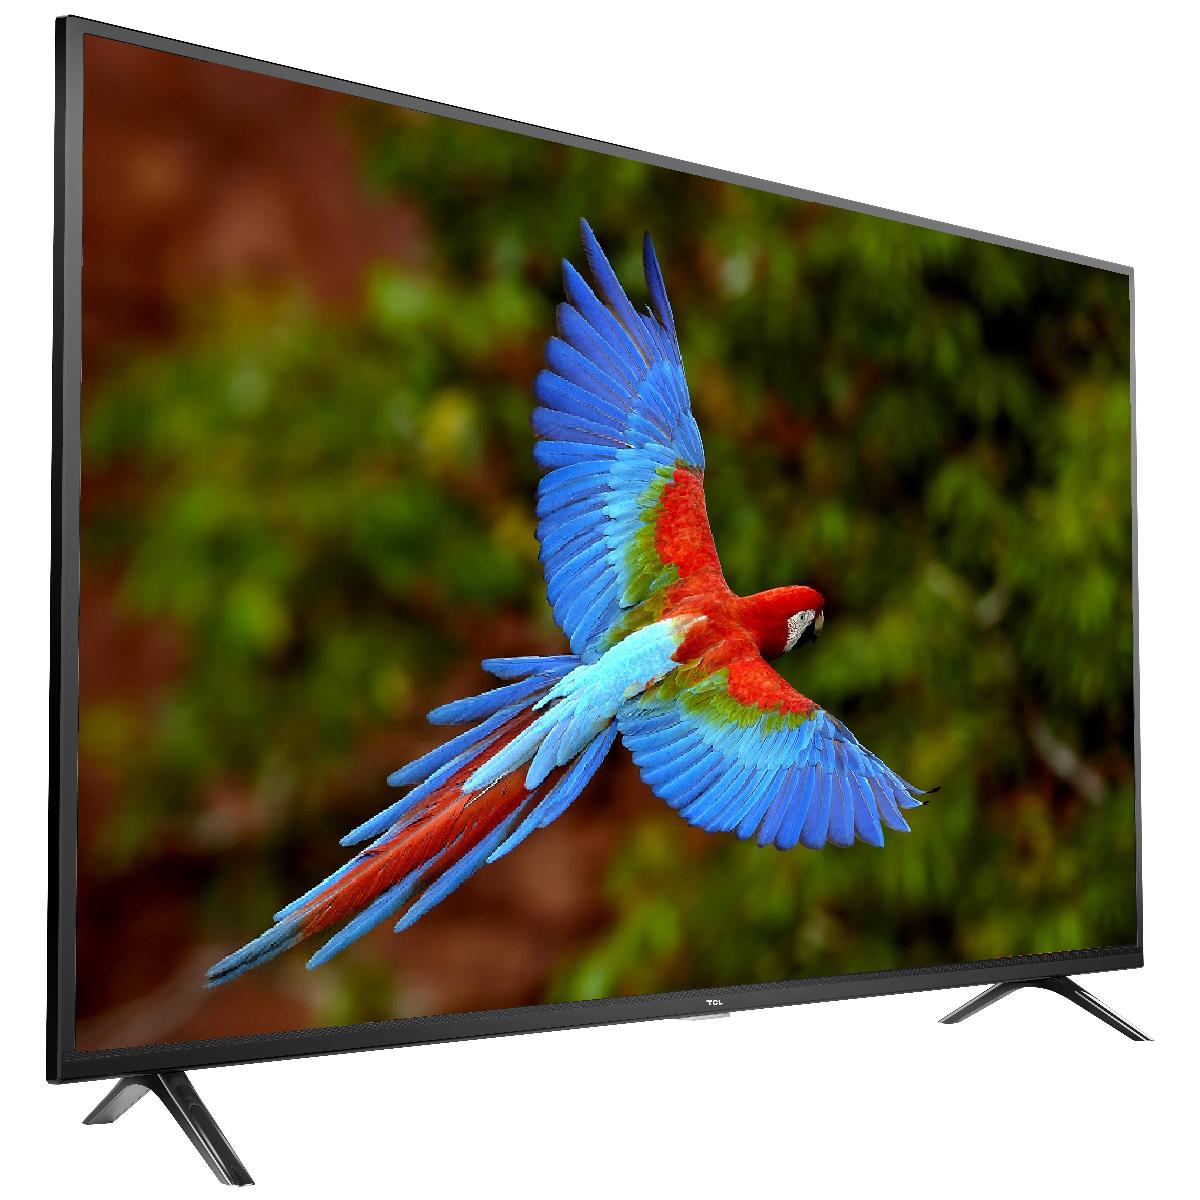 تلویزیون ال ای دی تی سی ال مدل 43D3000i سایز 43 اینچ main 1 2